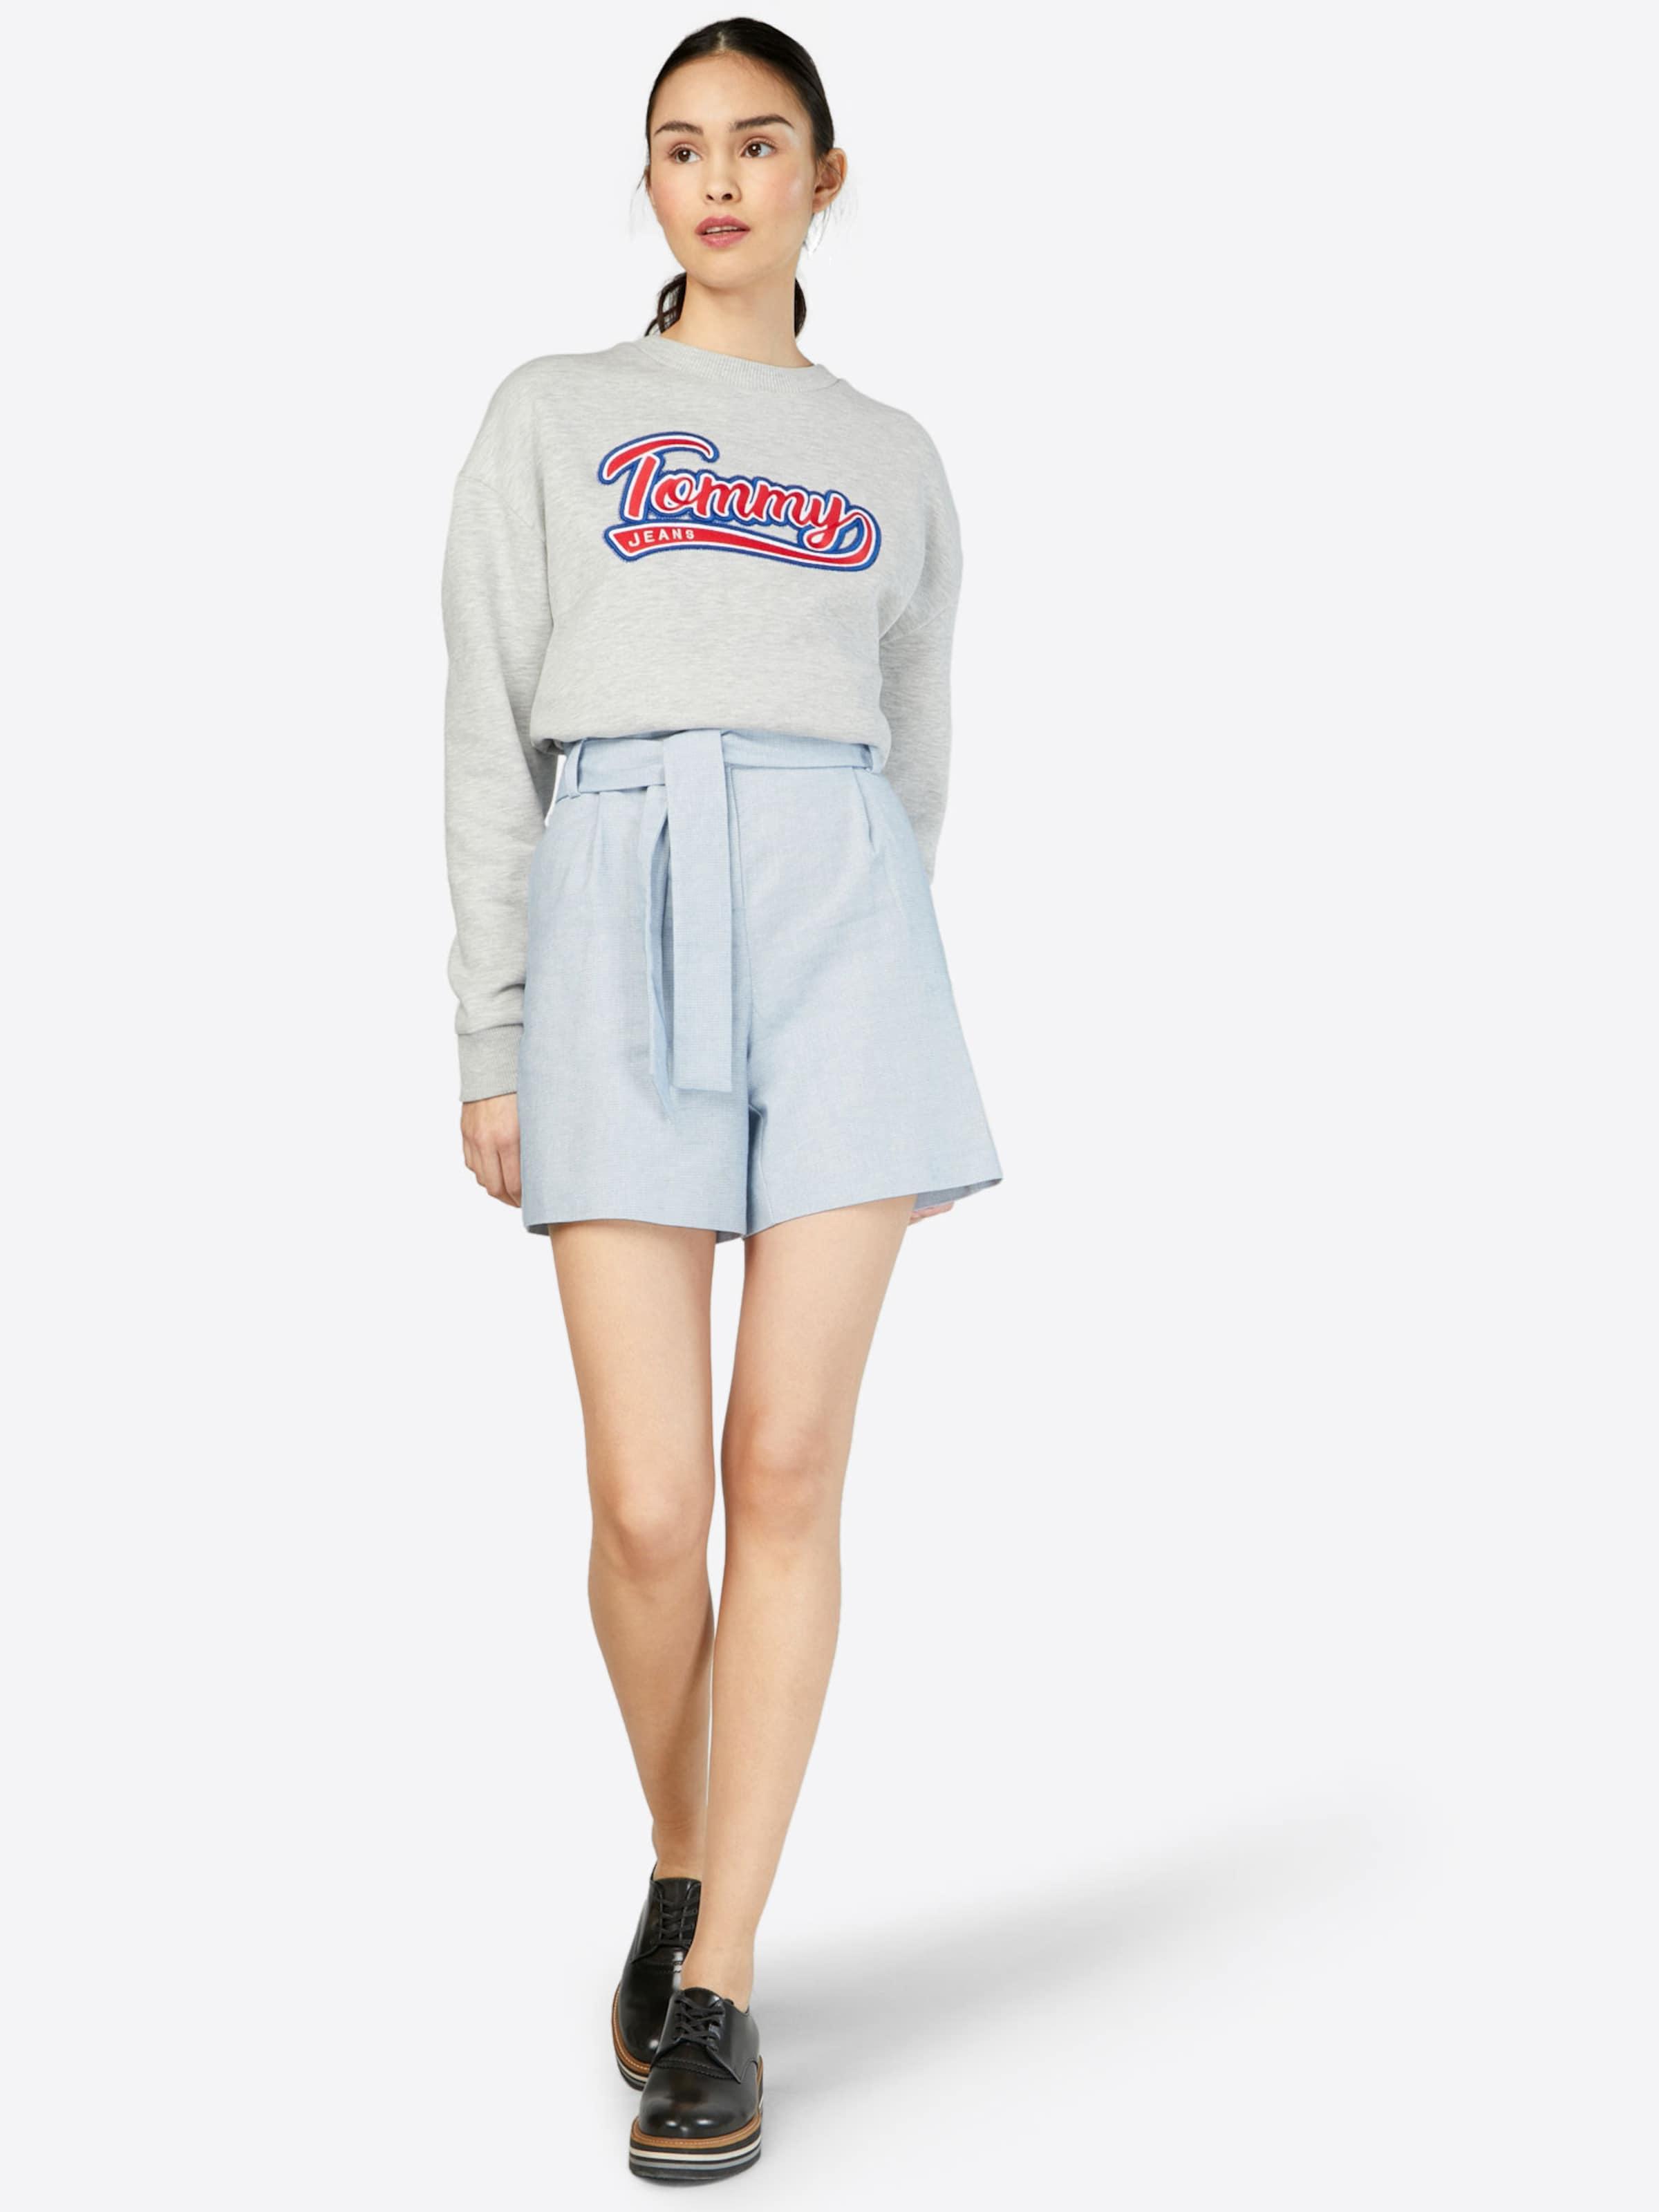 Tommy Jeans Sweatshirt Auslass Eastbay 100% Original Zum Verkauf fIm9ezW